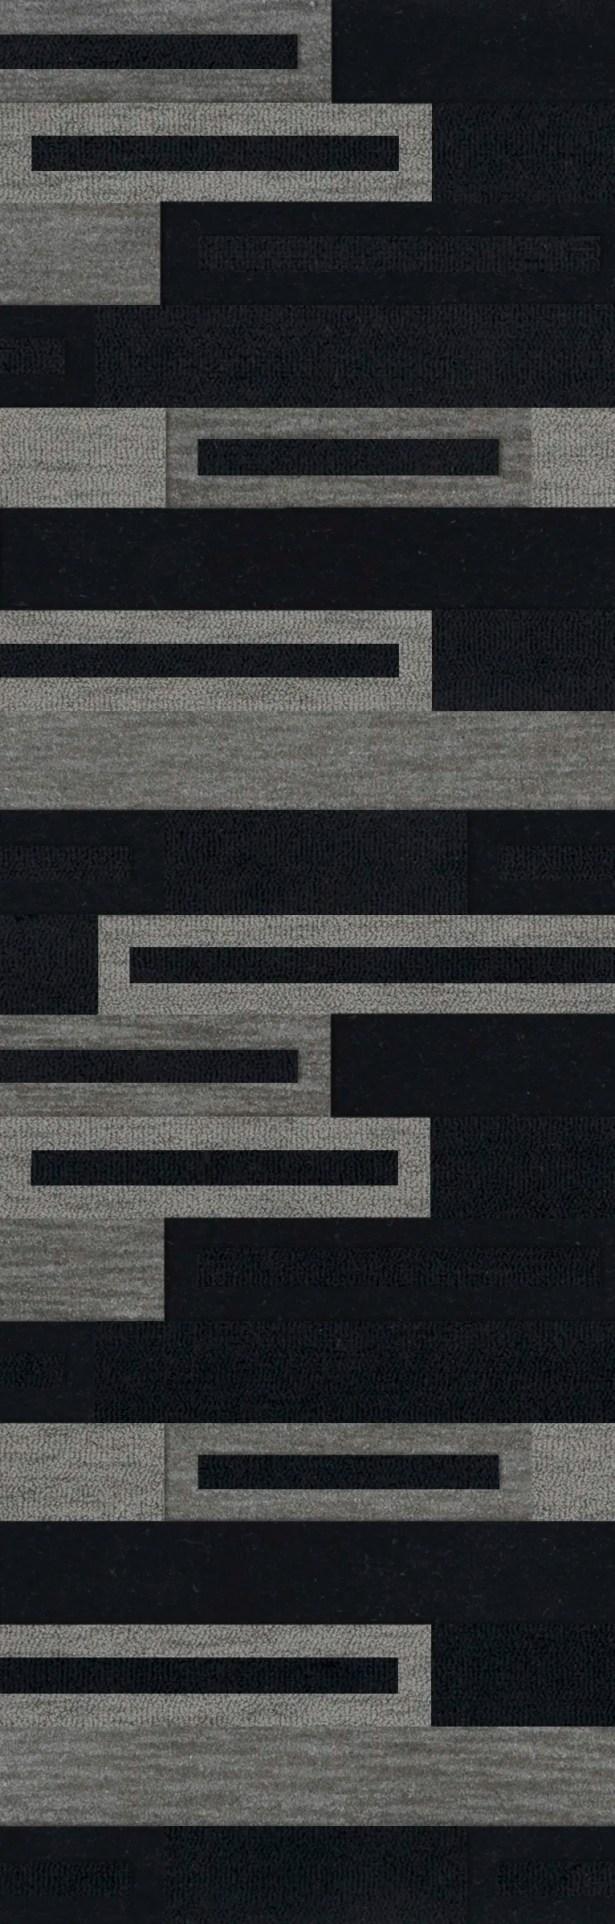 Bella Machine Woven Wool Black/Gray Area Rug Rug Size: Runner 2'6